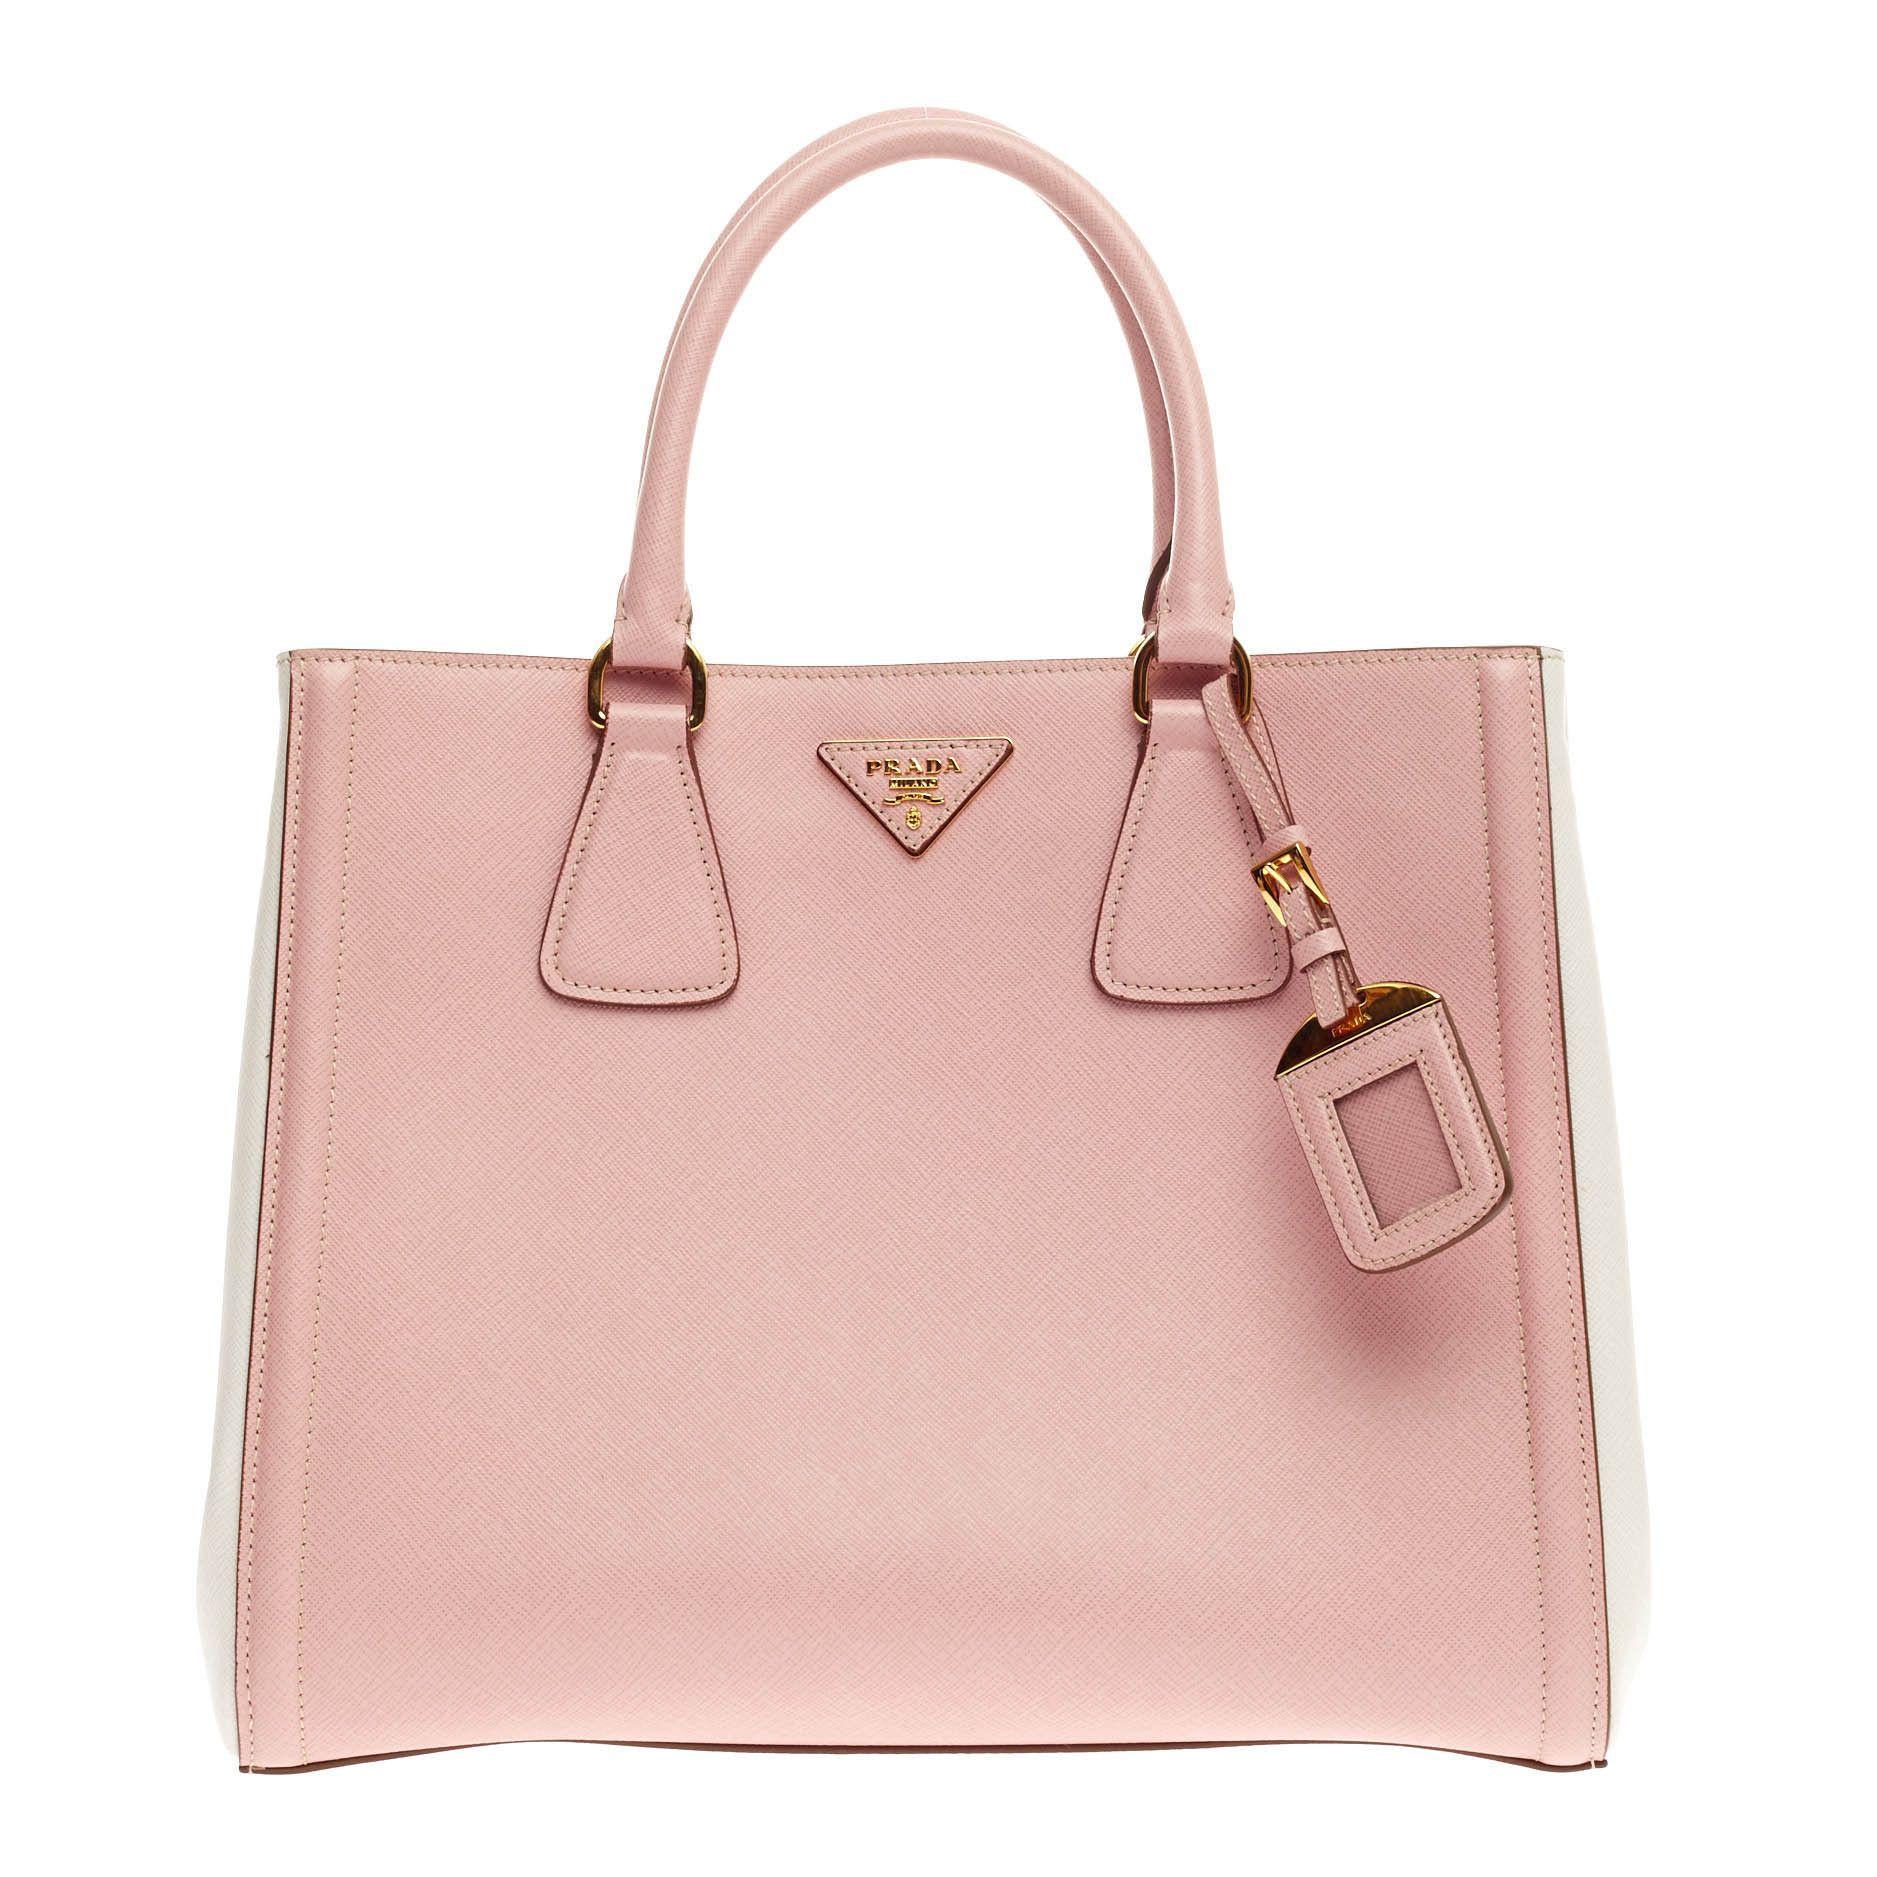 c46487c99ca9 ... clearance prada bicolor lux saffiano pink leather small tote bag 92948  05fec ...